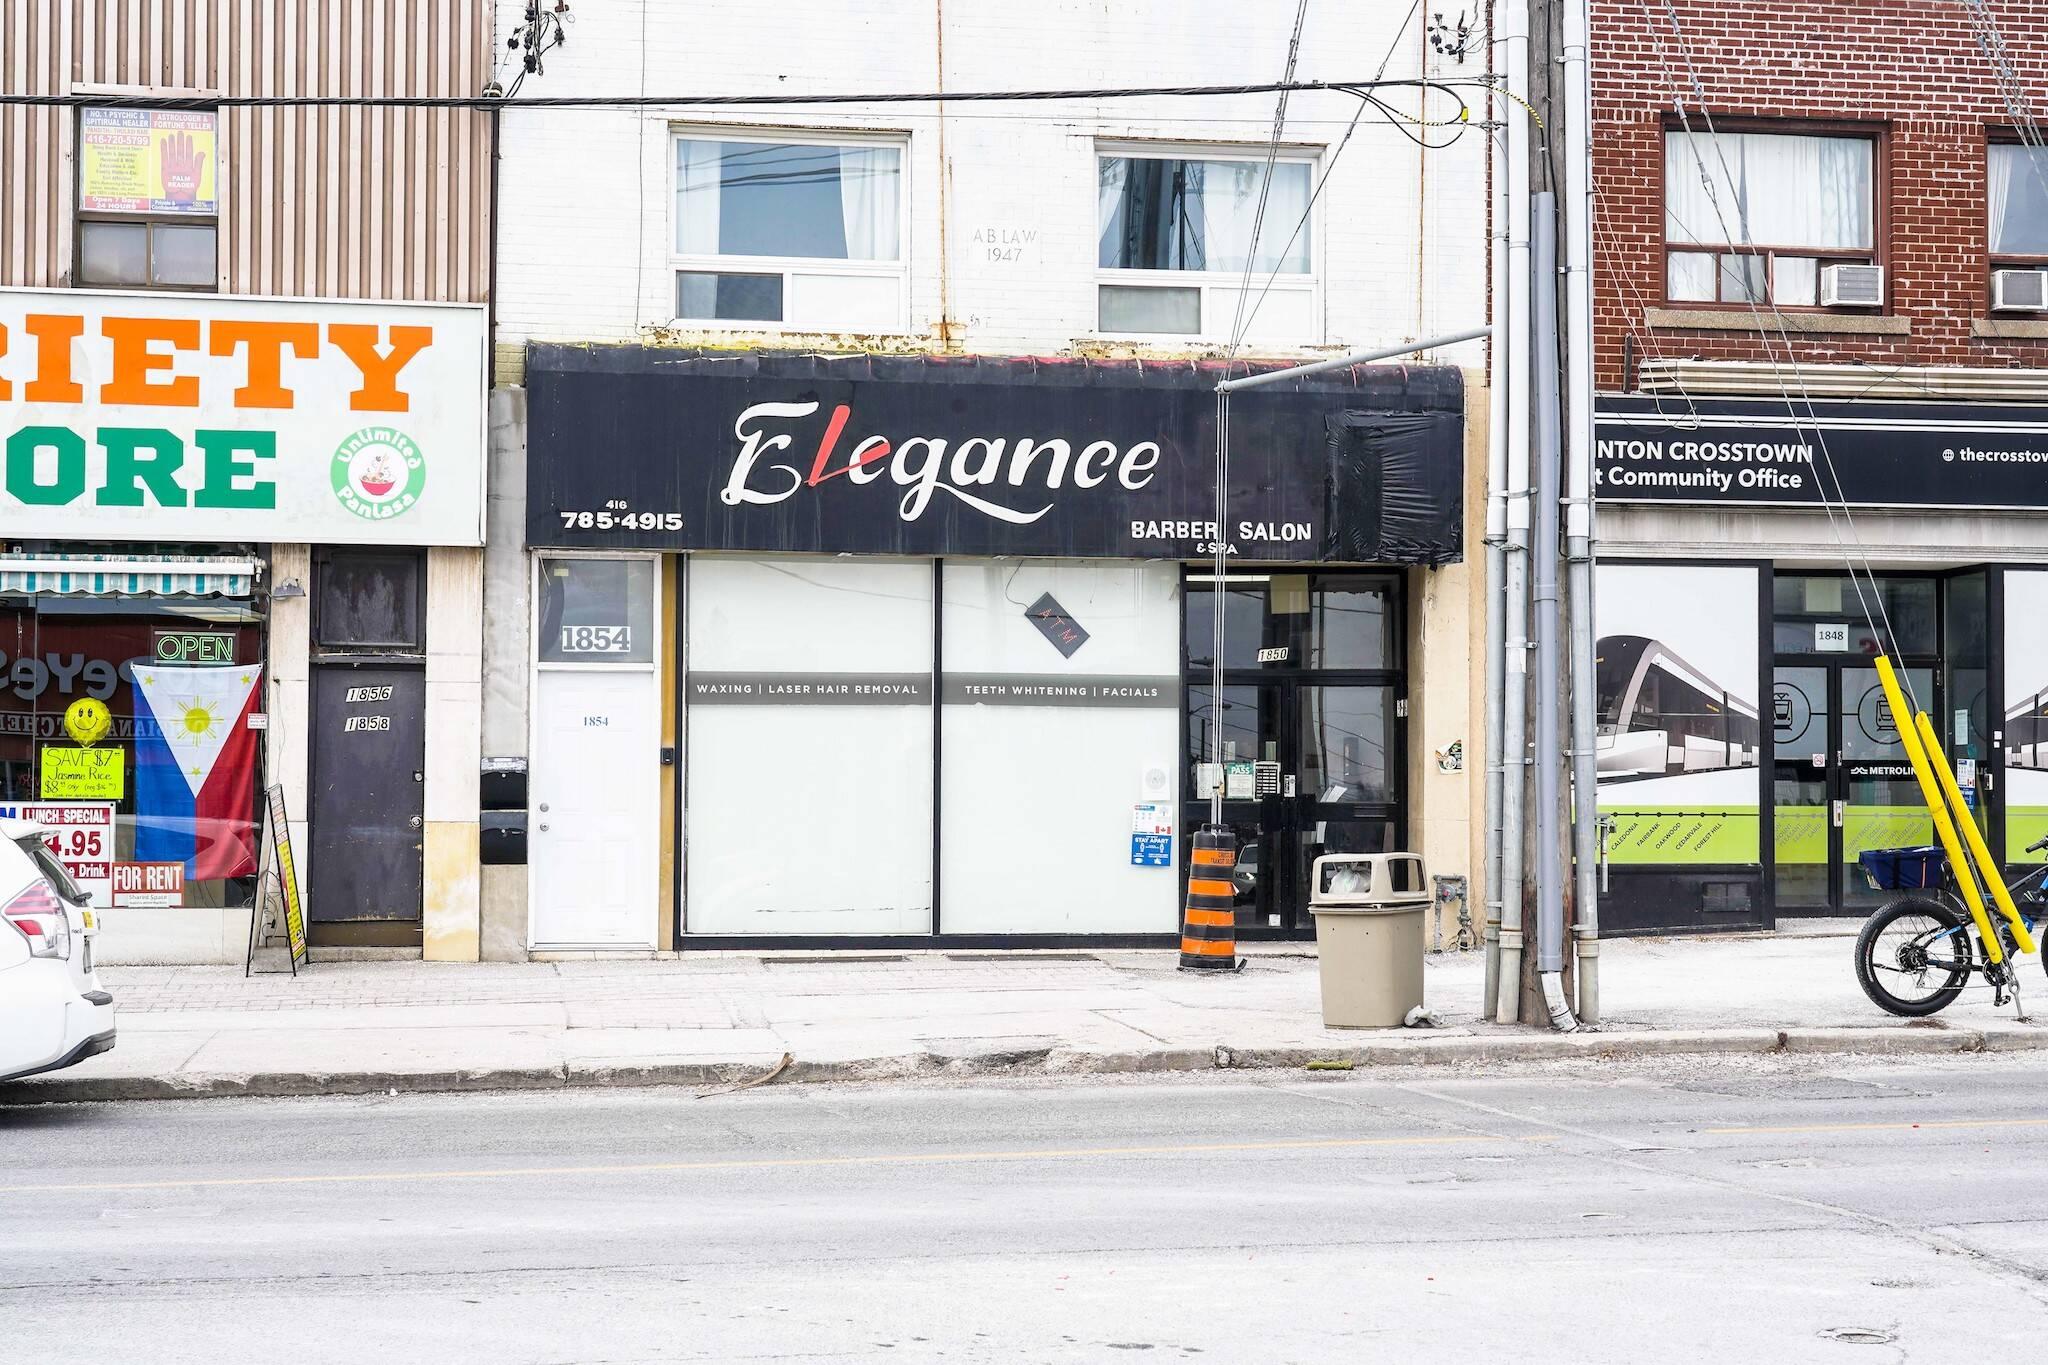 elegance barber salon toronto